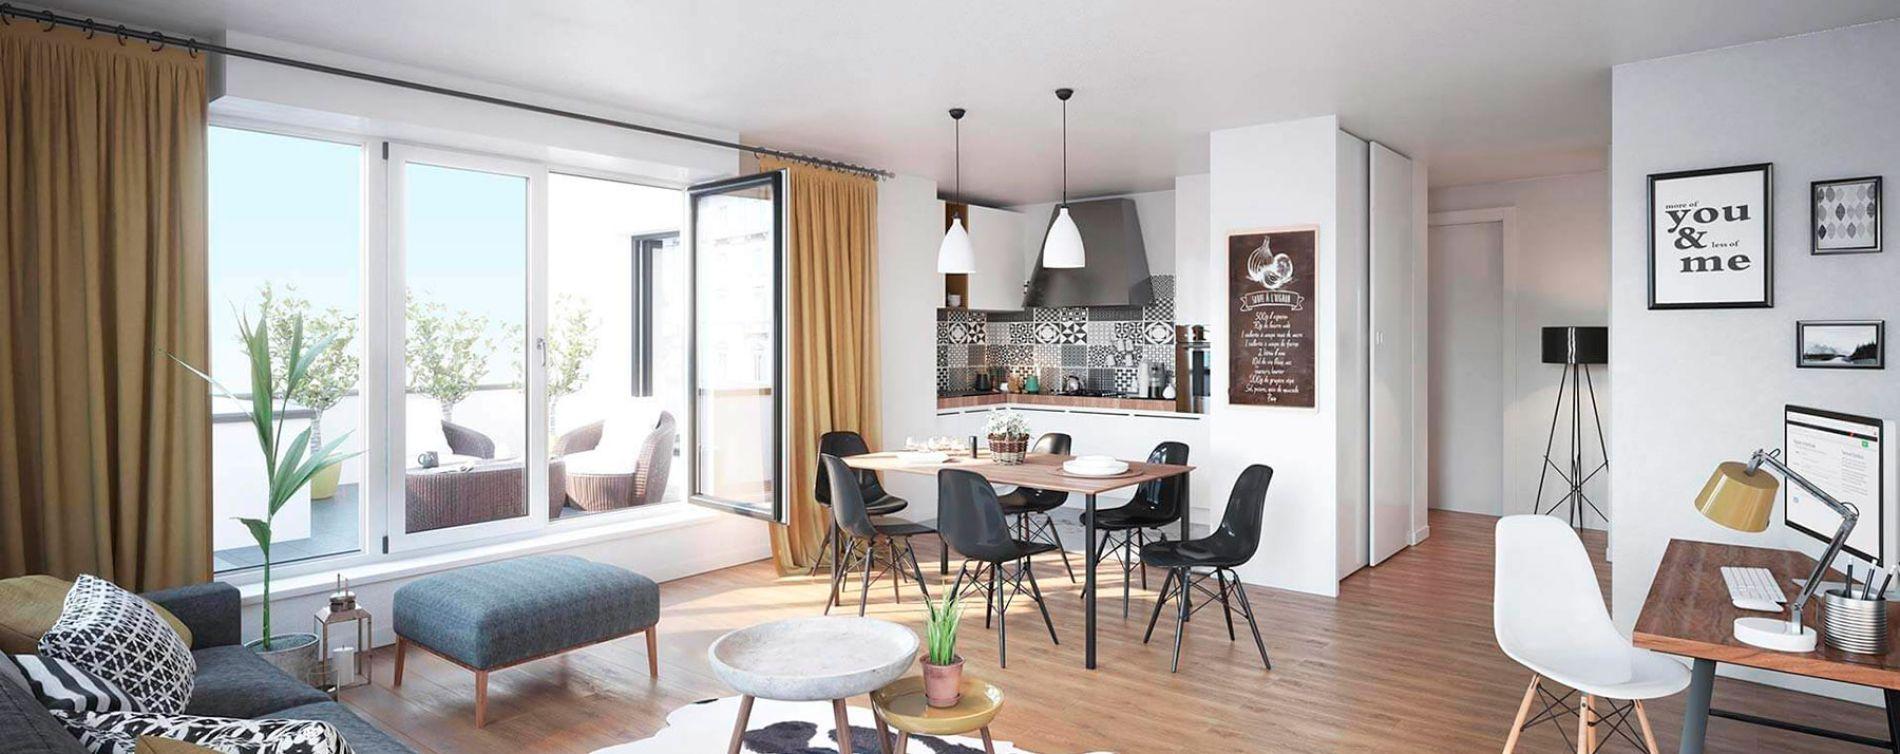 Le Plessis-Bouchard : programme immobilier neuve « Coeur Plessis » (2)